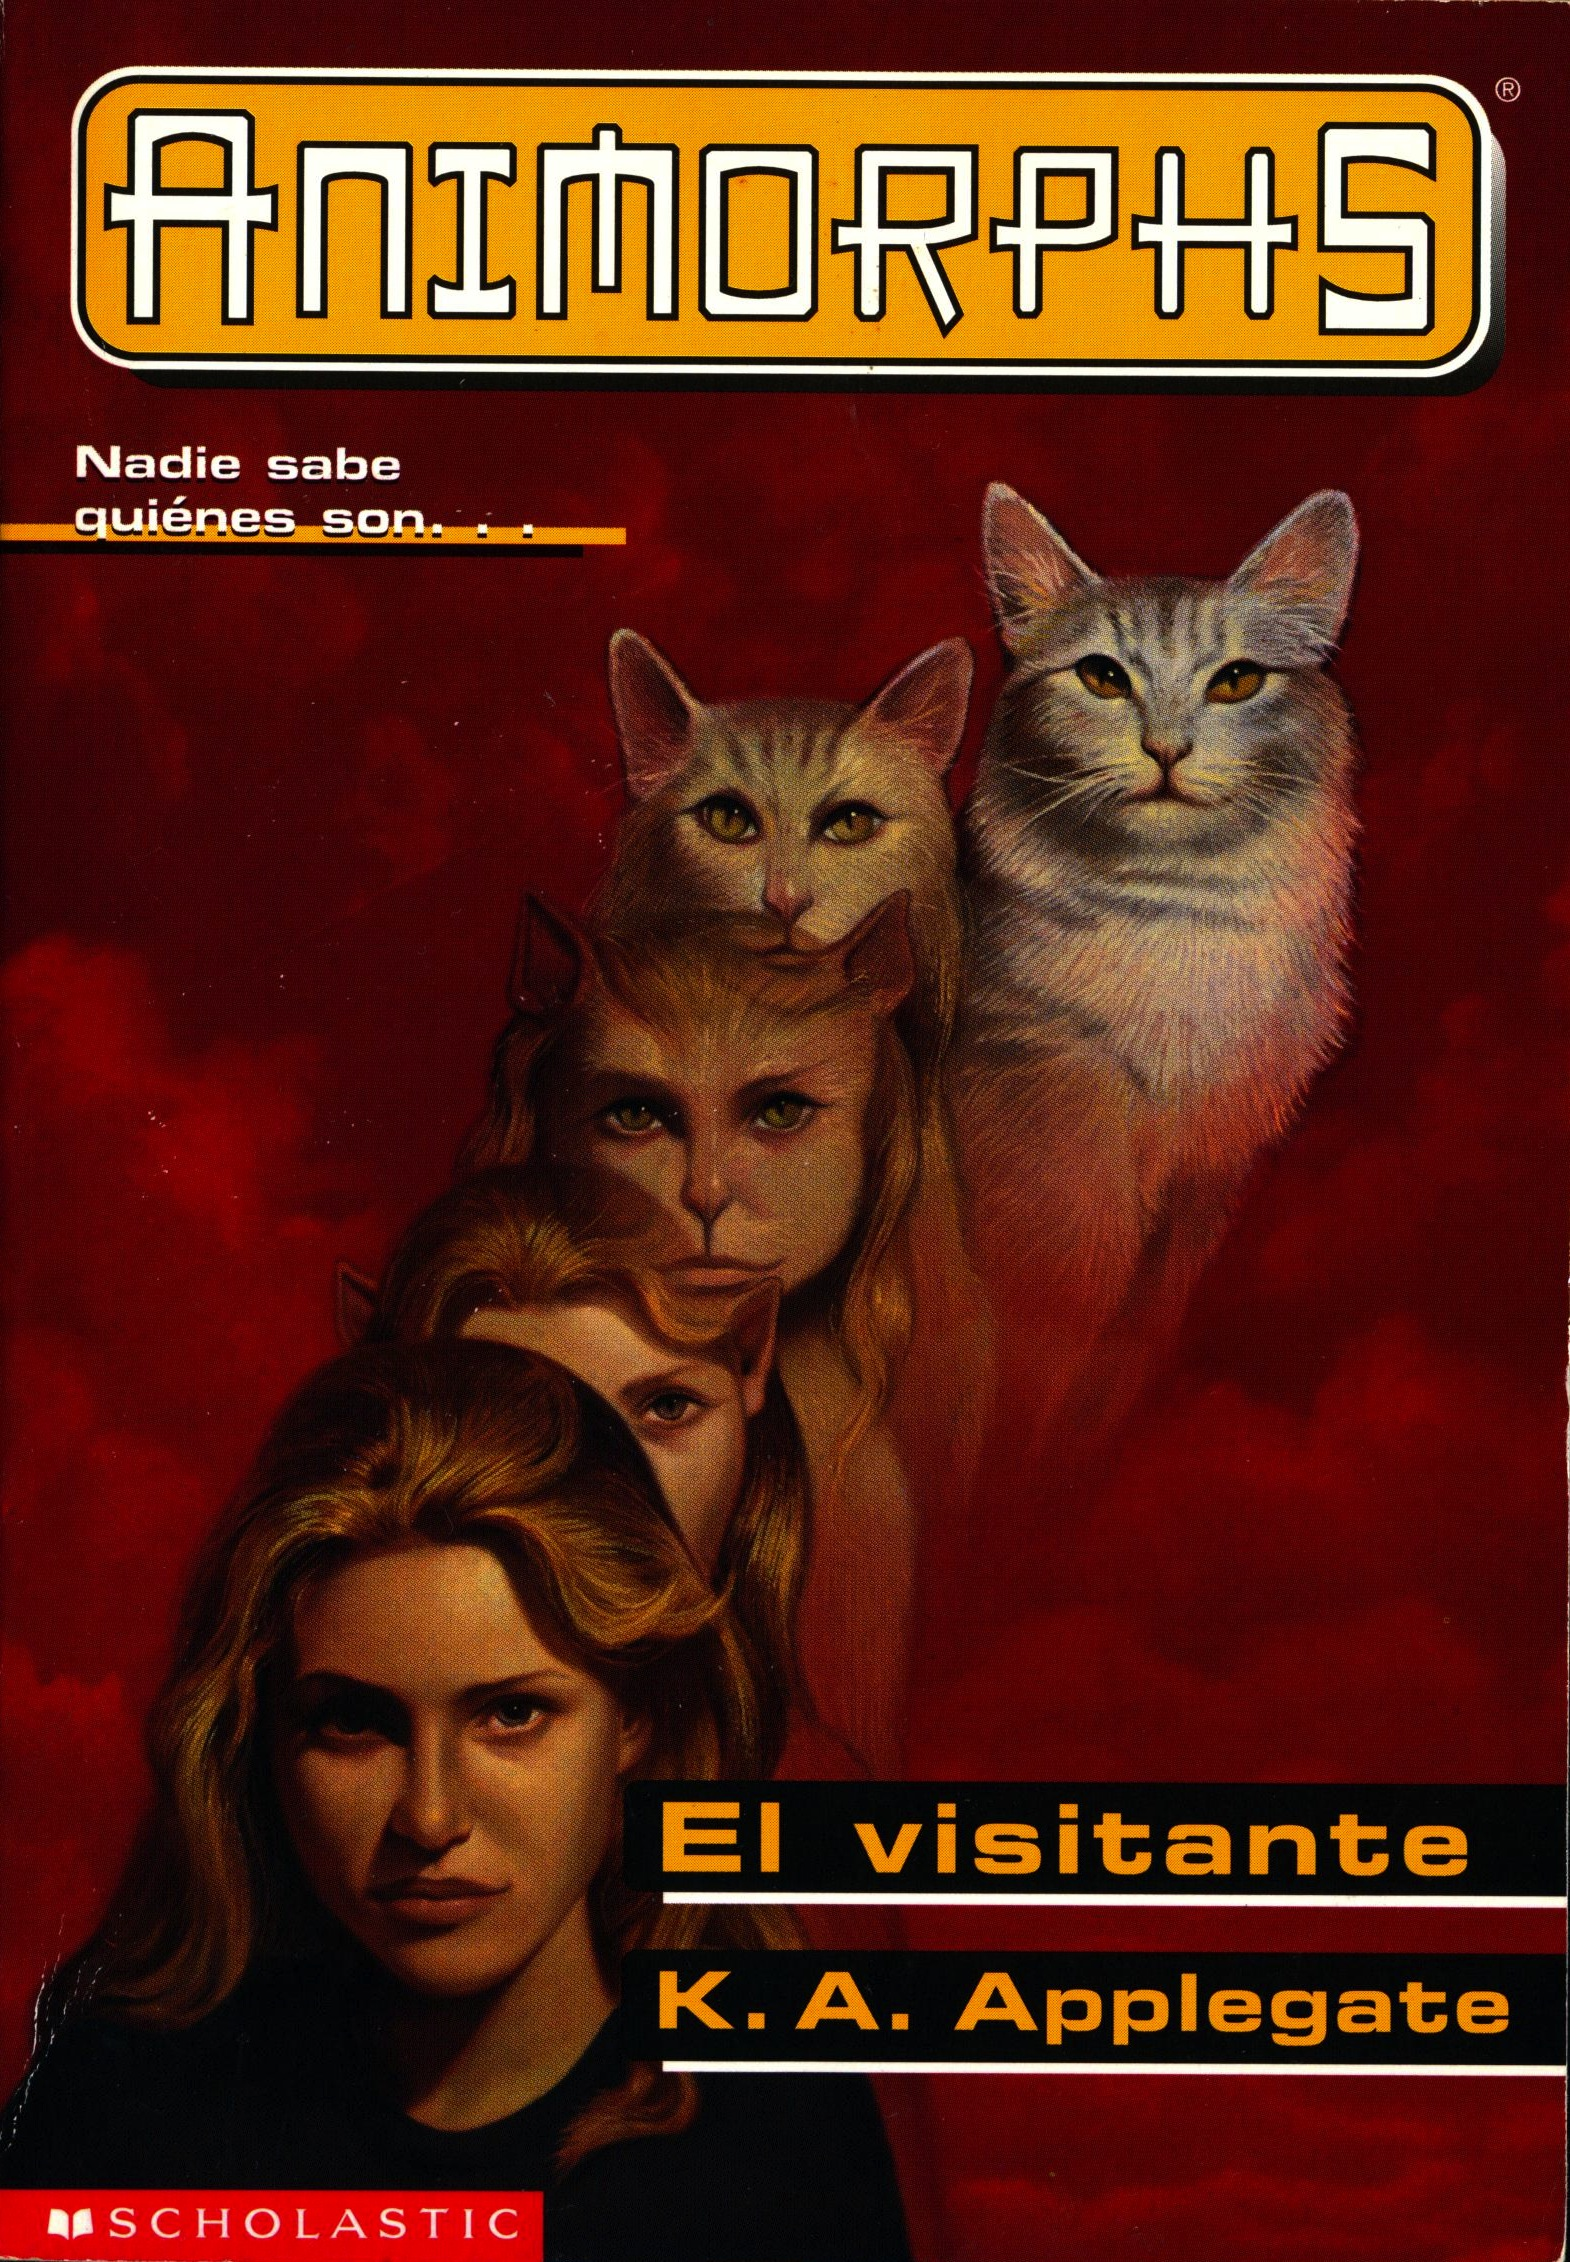 image animorphs book 2 the visitor spanish cover el visitante jpg